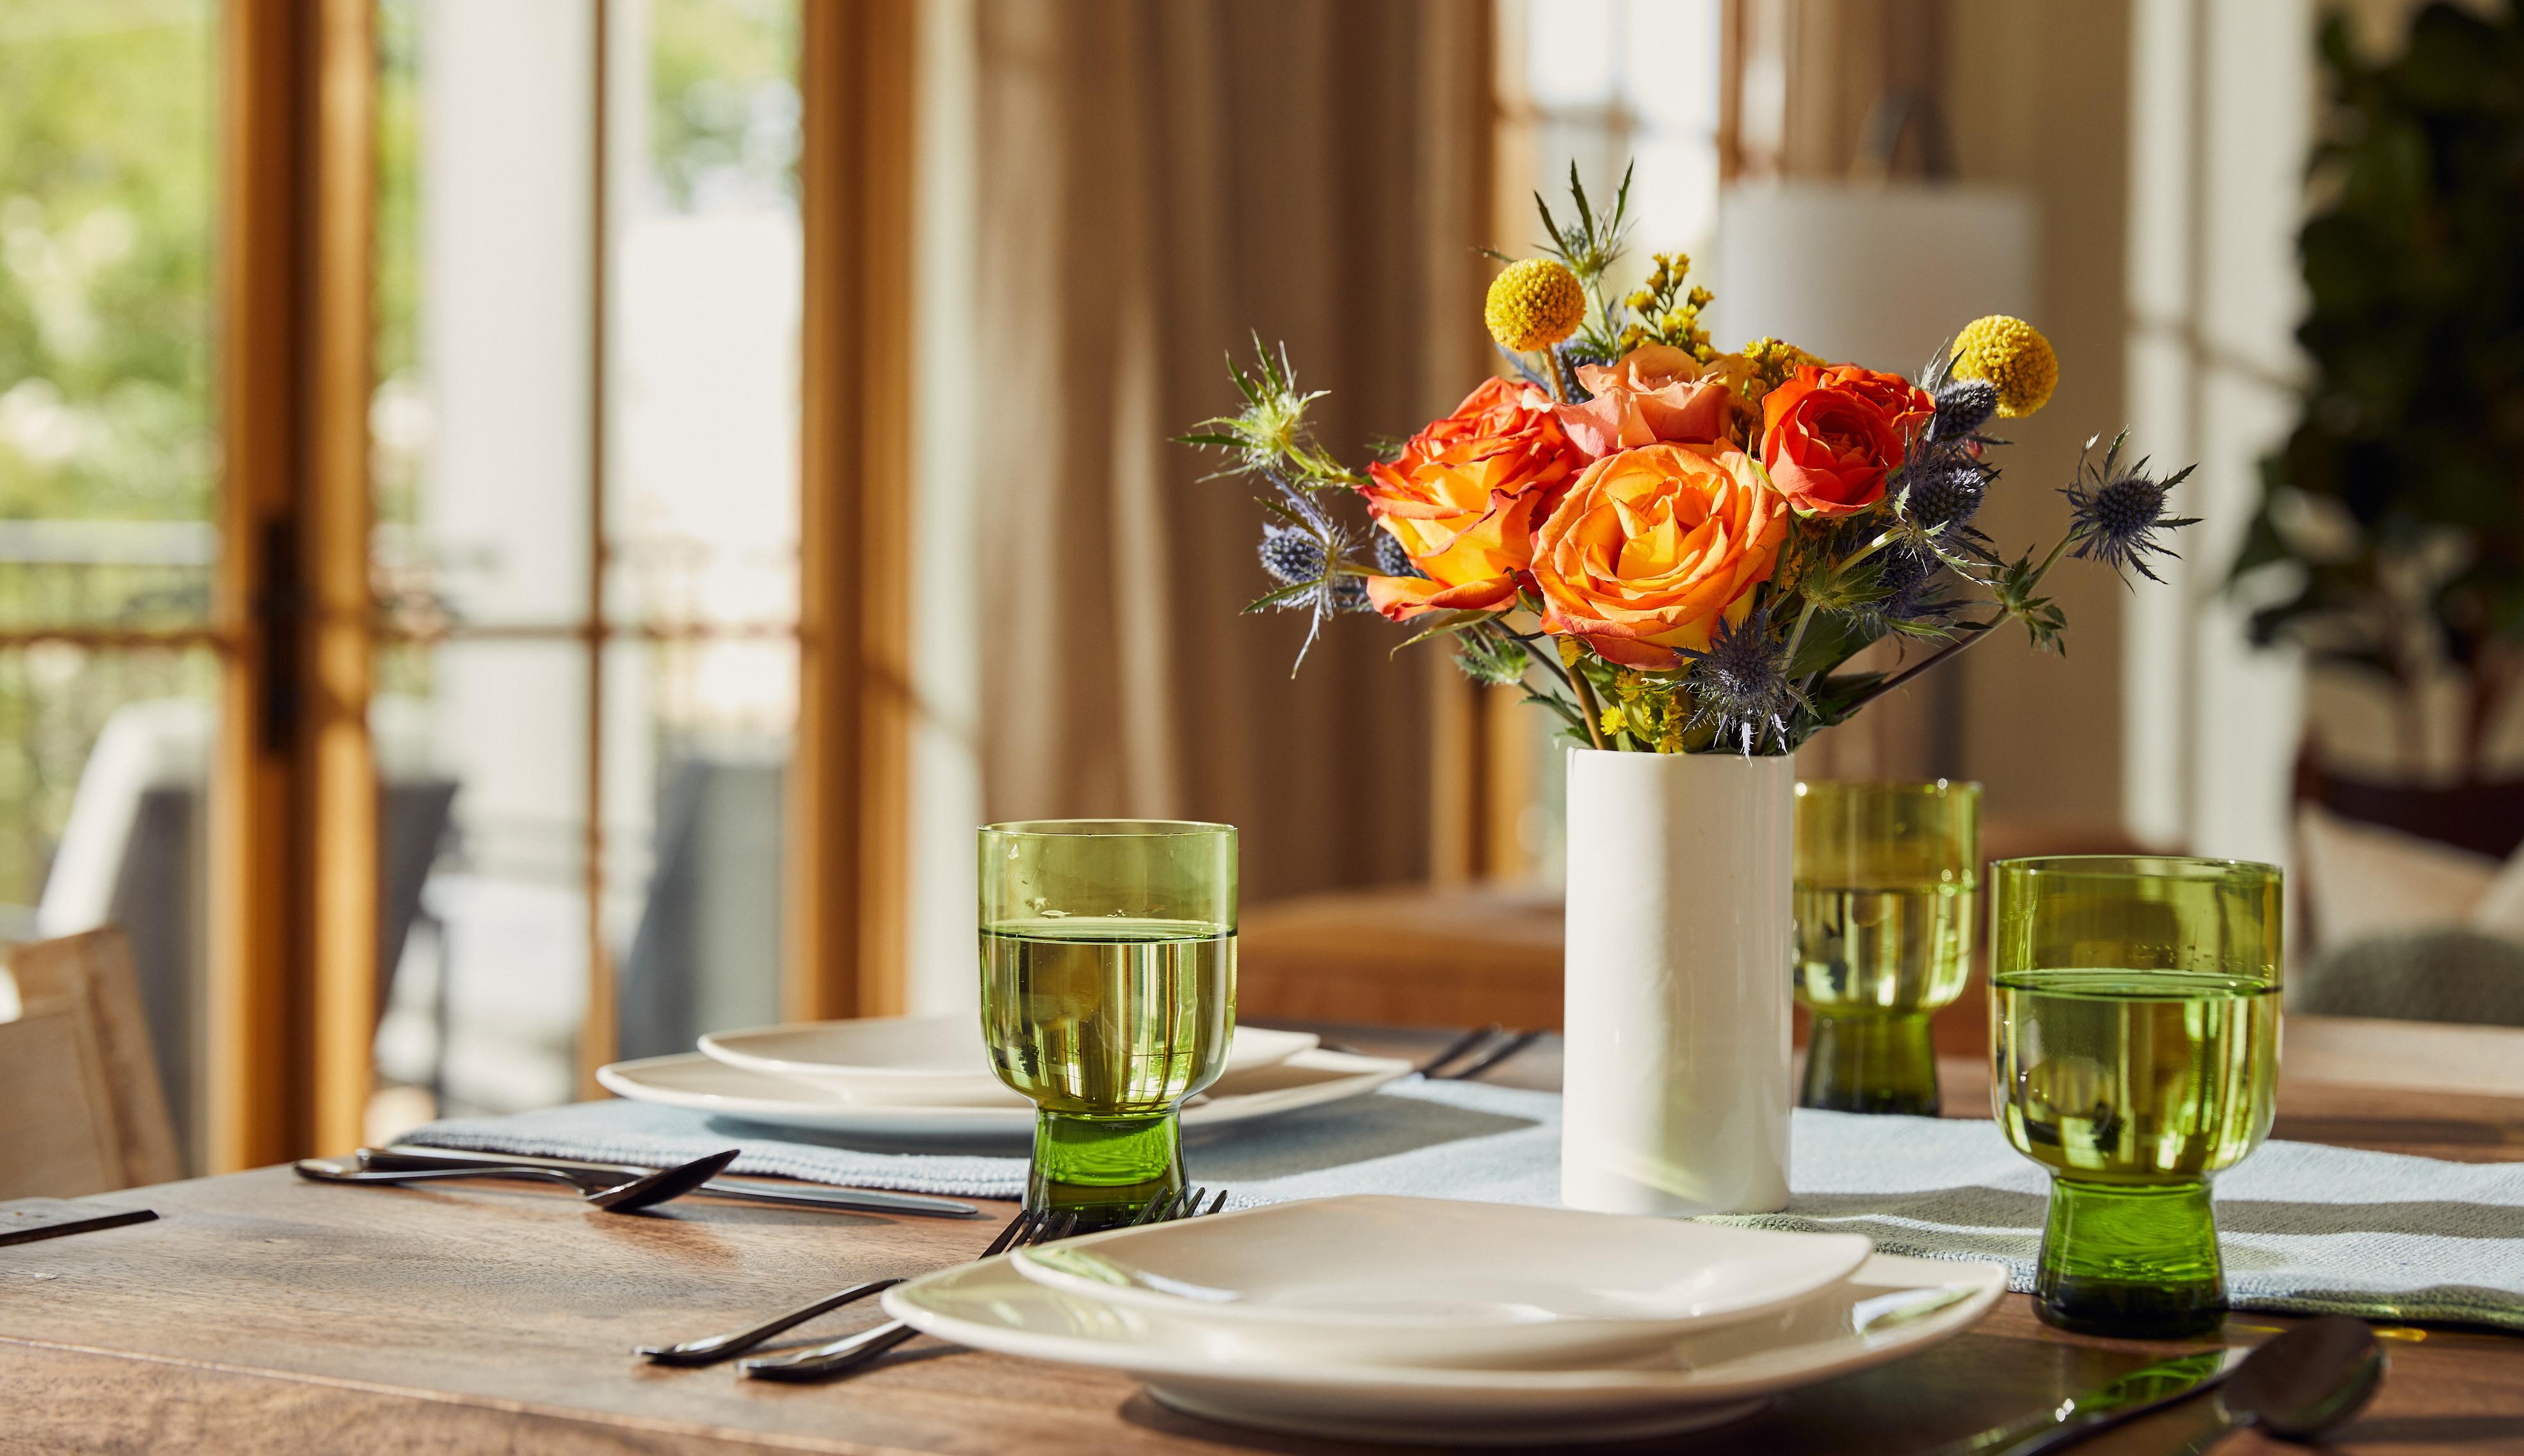 A mini bouquet on a set table